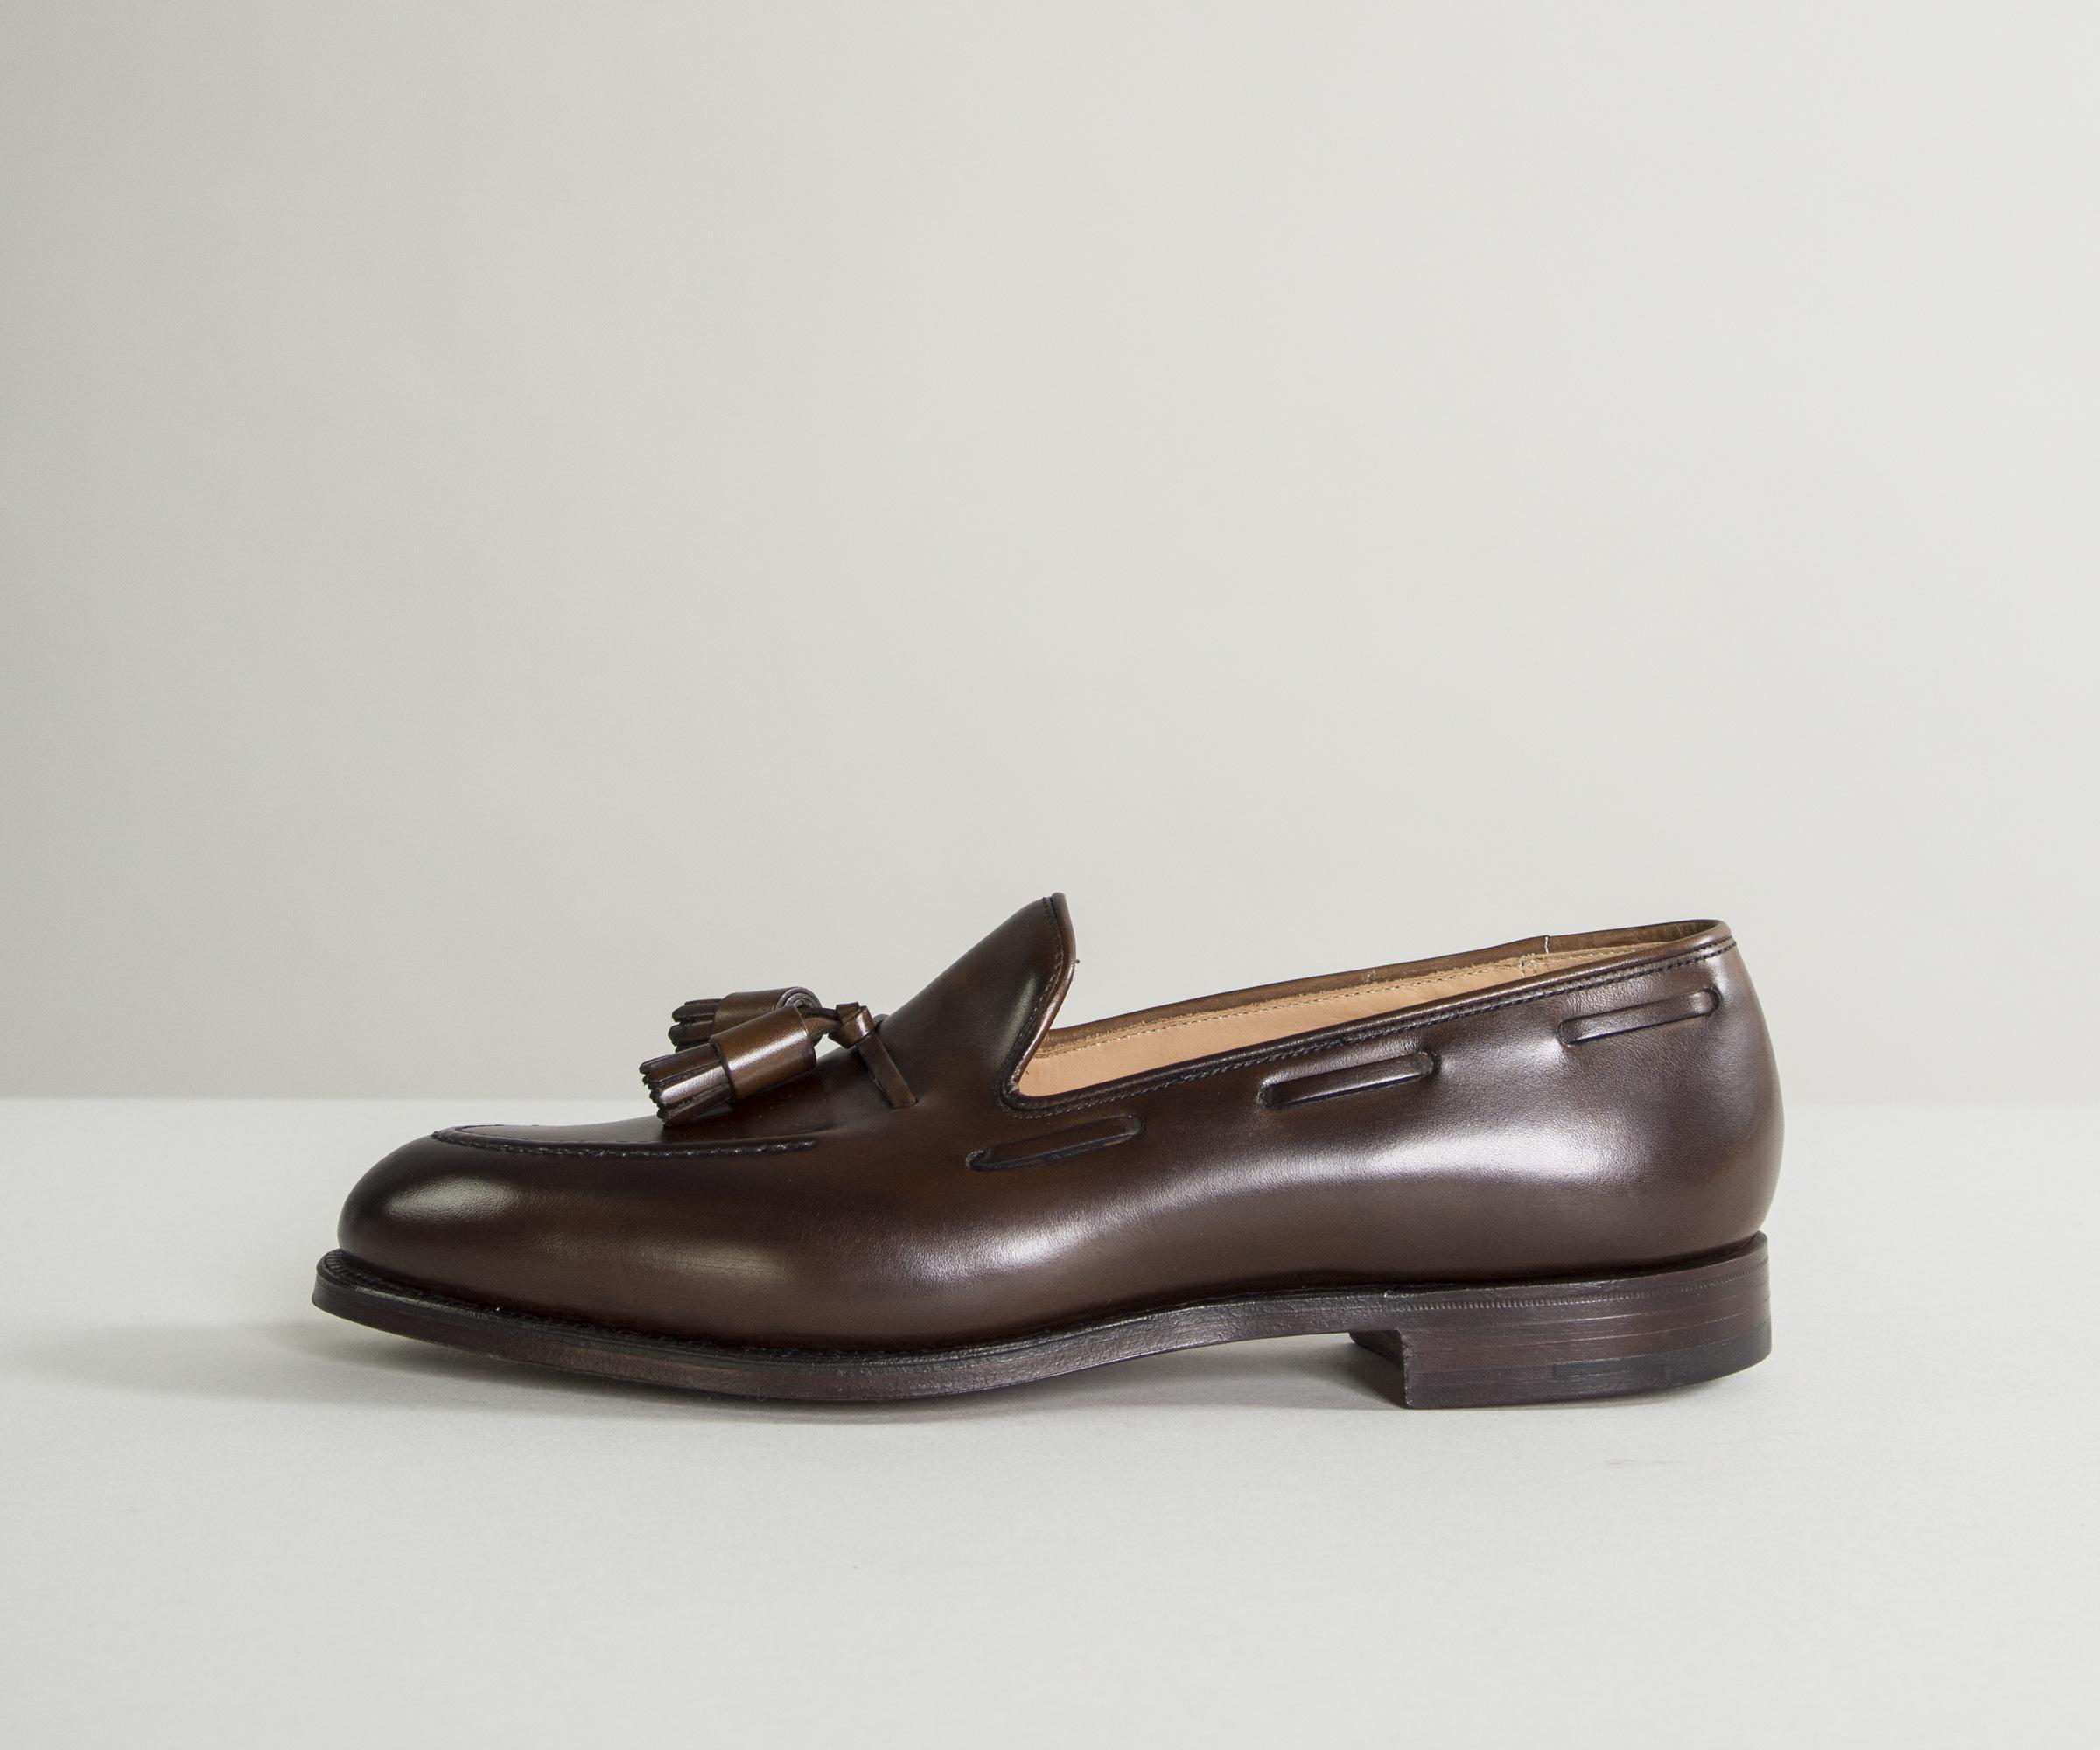 87368c61aca Crockett and Jones. Men s  cavendish  Burnished Calf Leather Loafers Dark  Brown